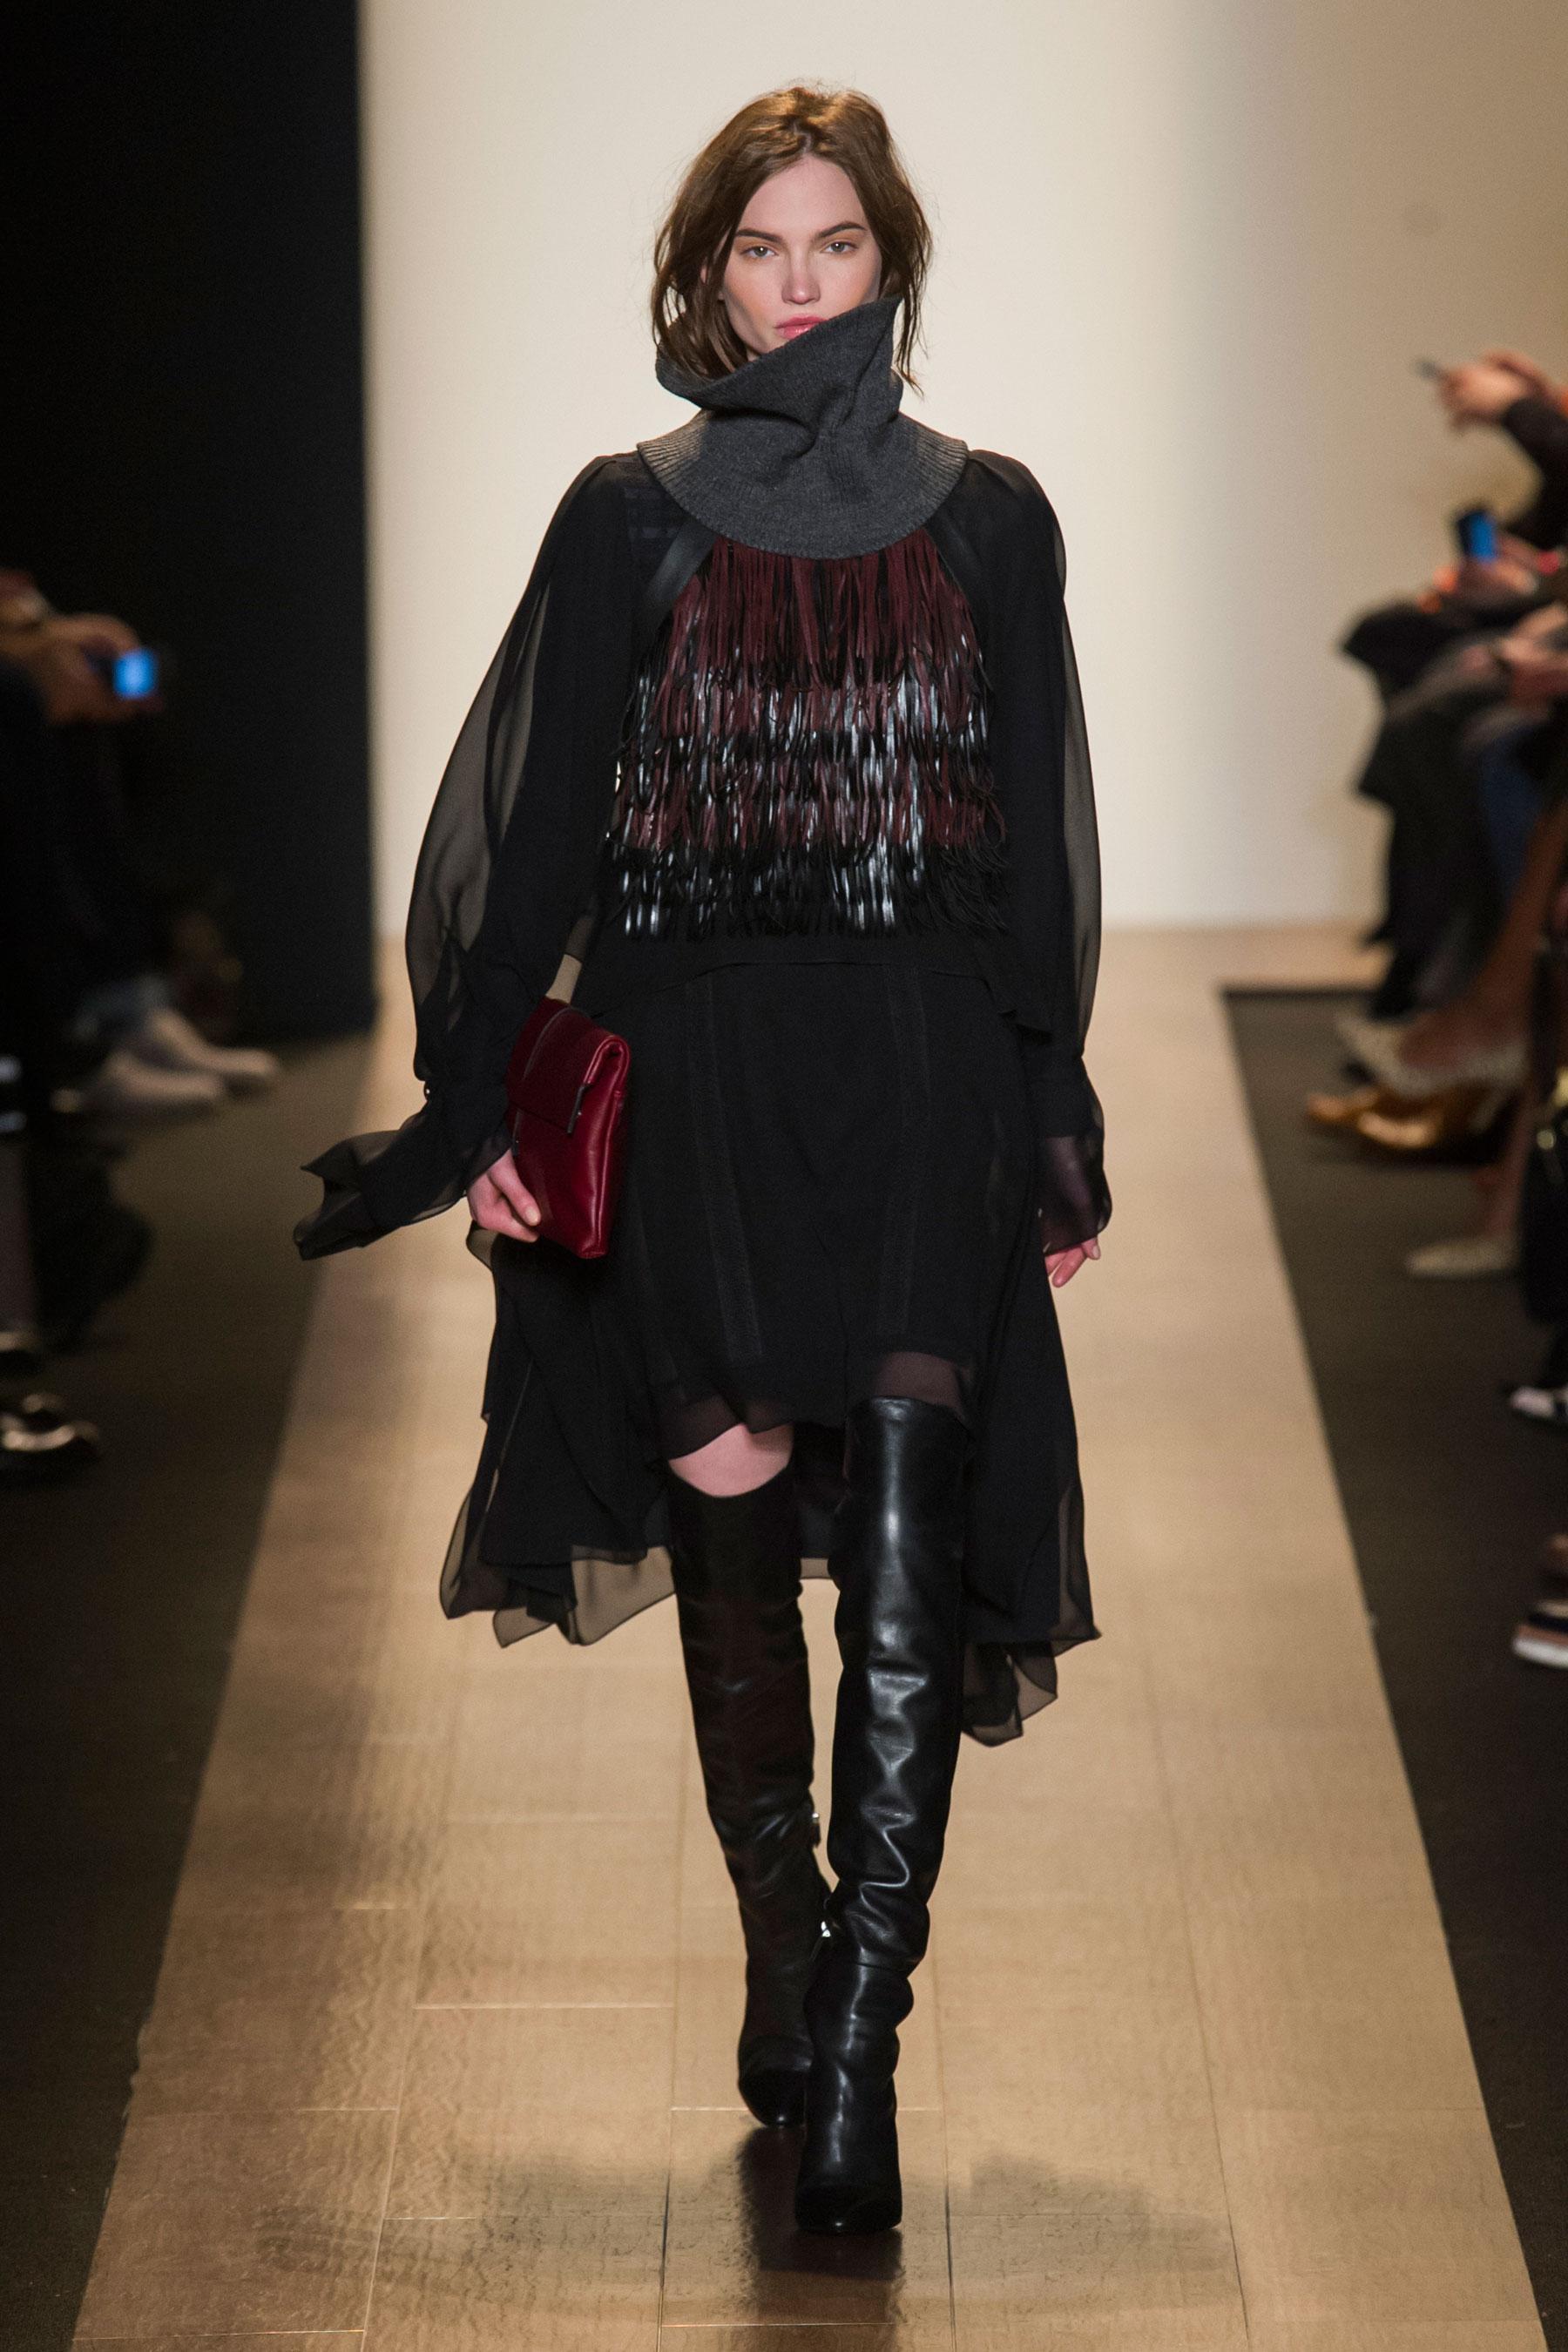 Défilé Bcbg Max Azria automne-hiver 2015-2016, New York - Look 28. Défilé  BCBG Max Azria Prêt-à-porter Automne-hiver 2015-2016 New York - photo 28  Imaxtree dd93a26b91d